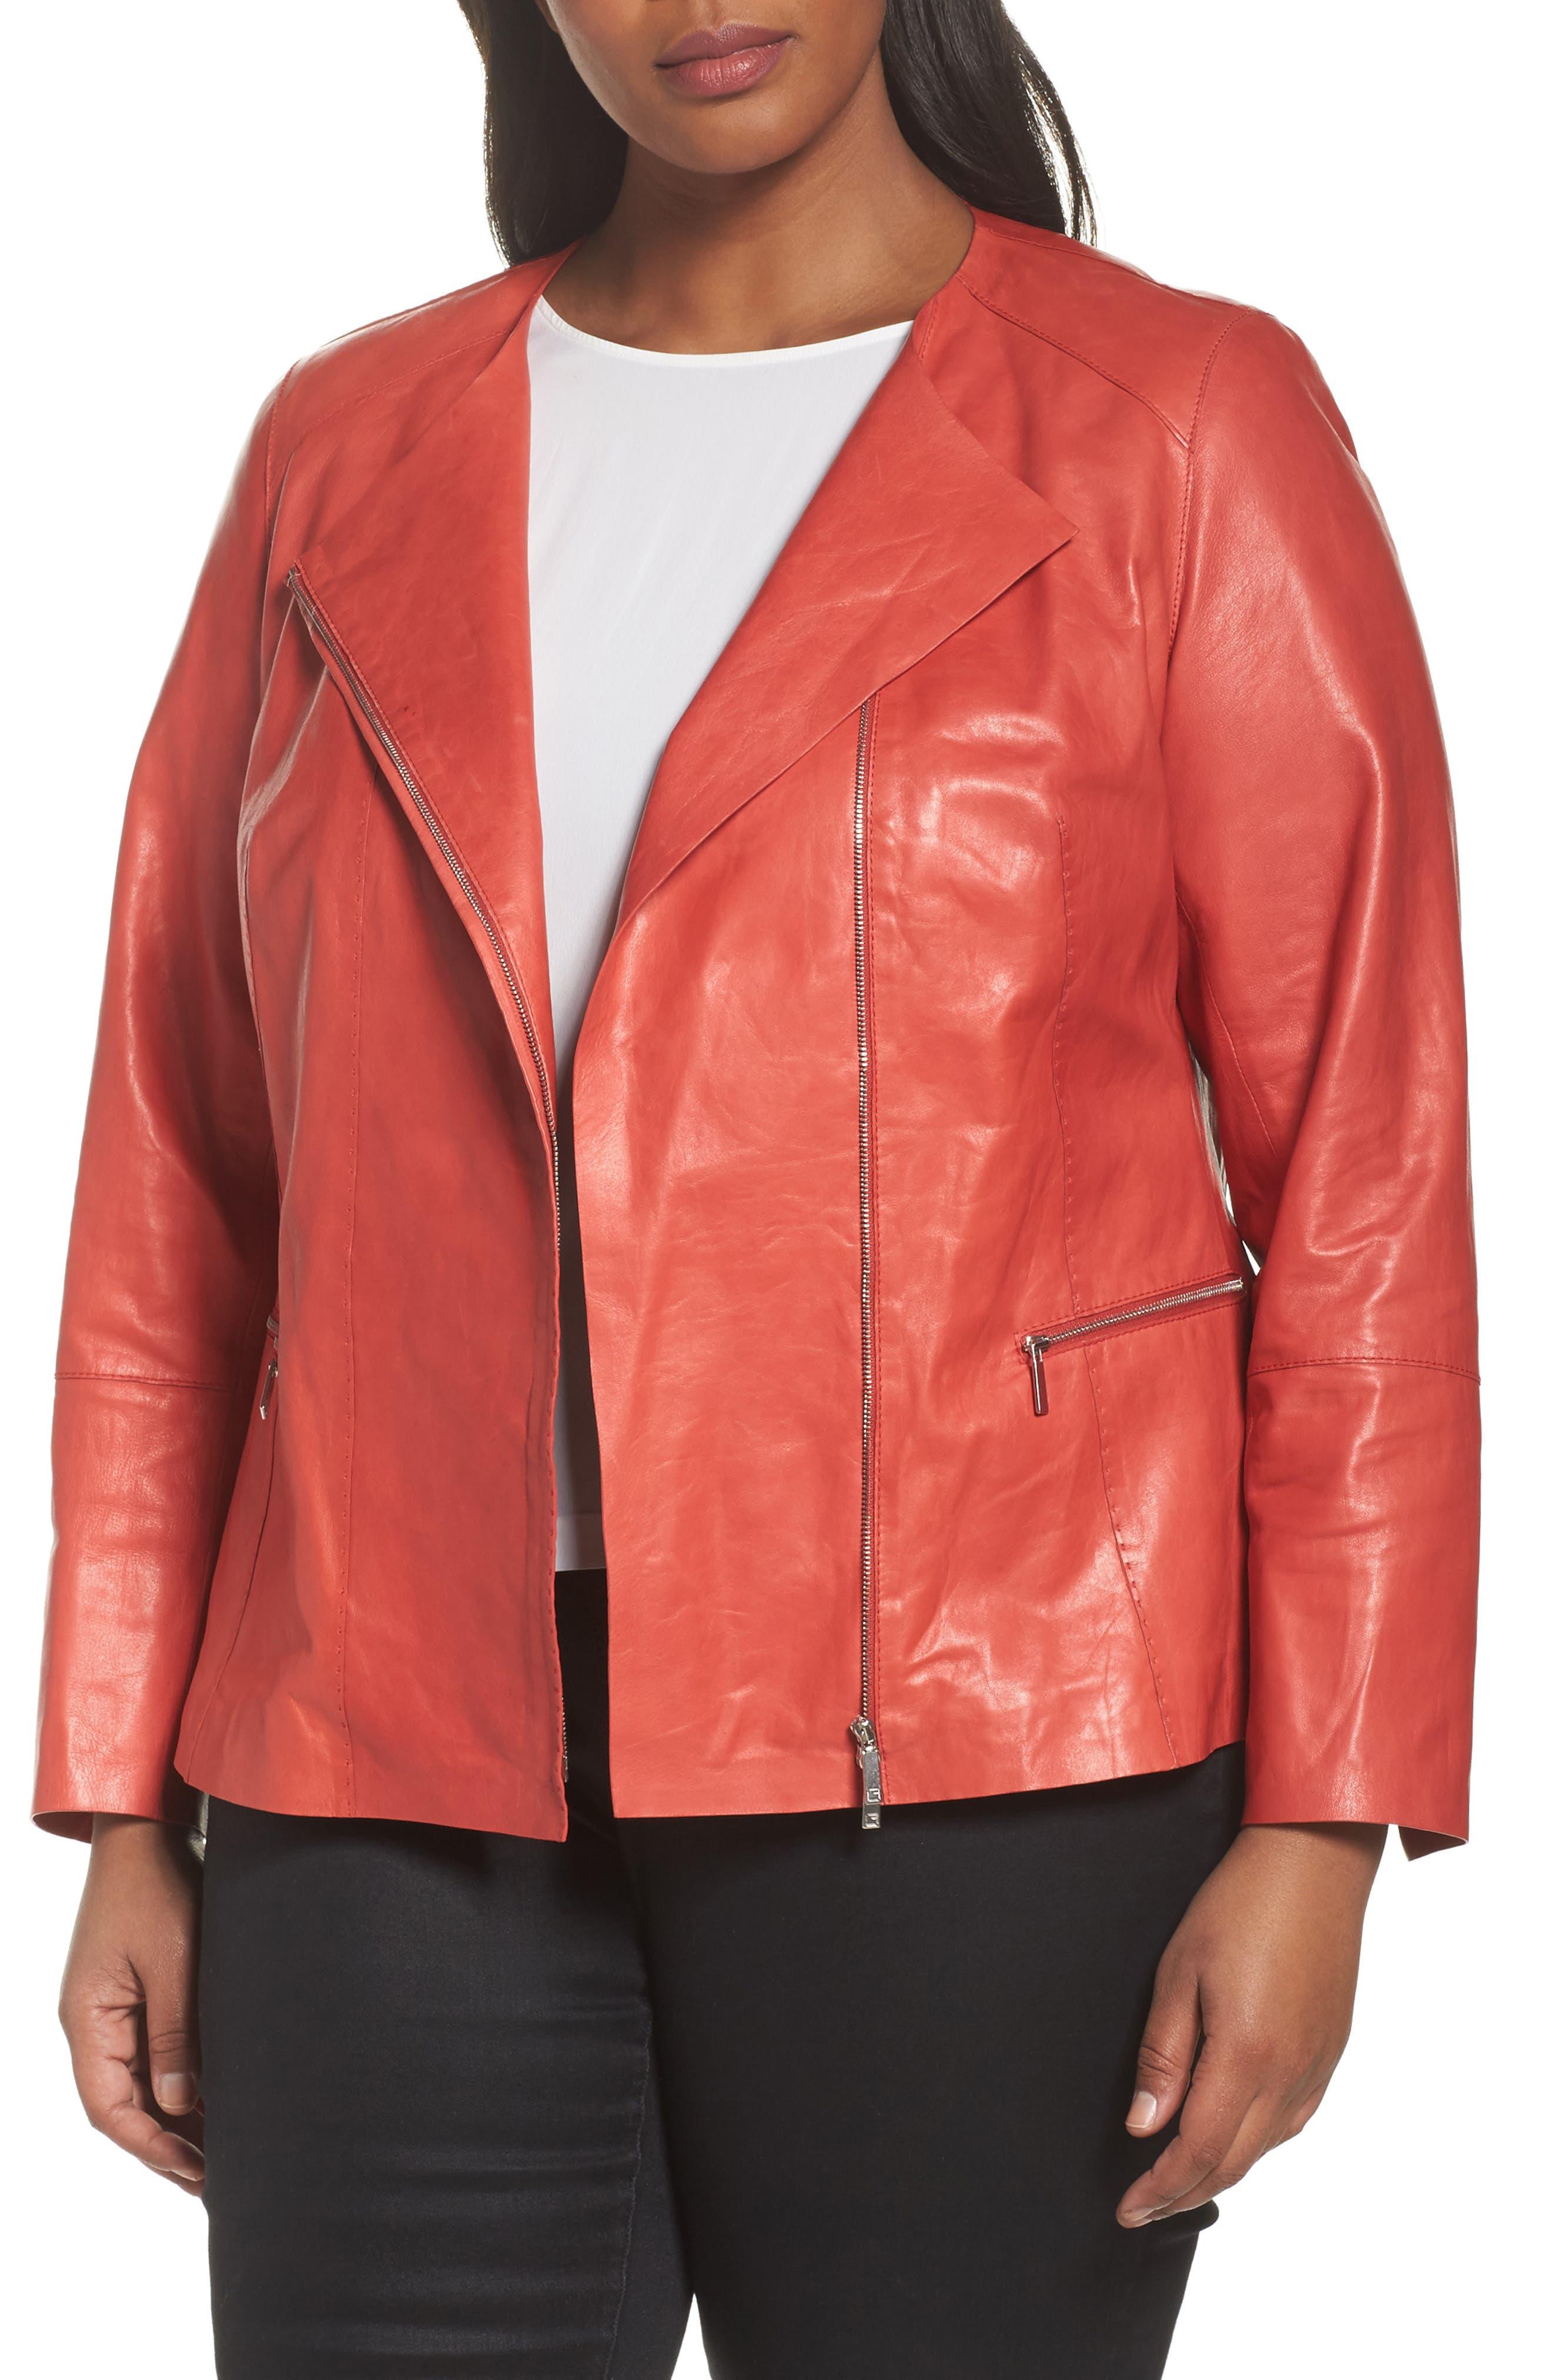 Caridee Glazed Lambskin Leather Jacket,                             Main thumbnail 1, color,                             604